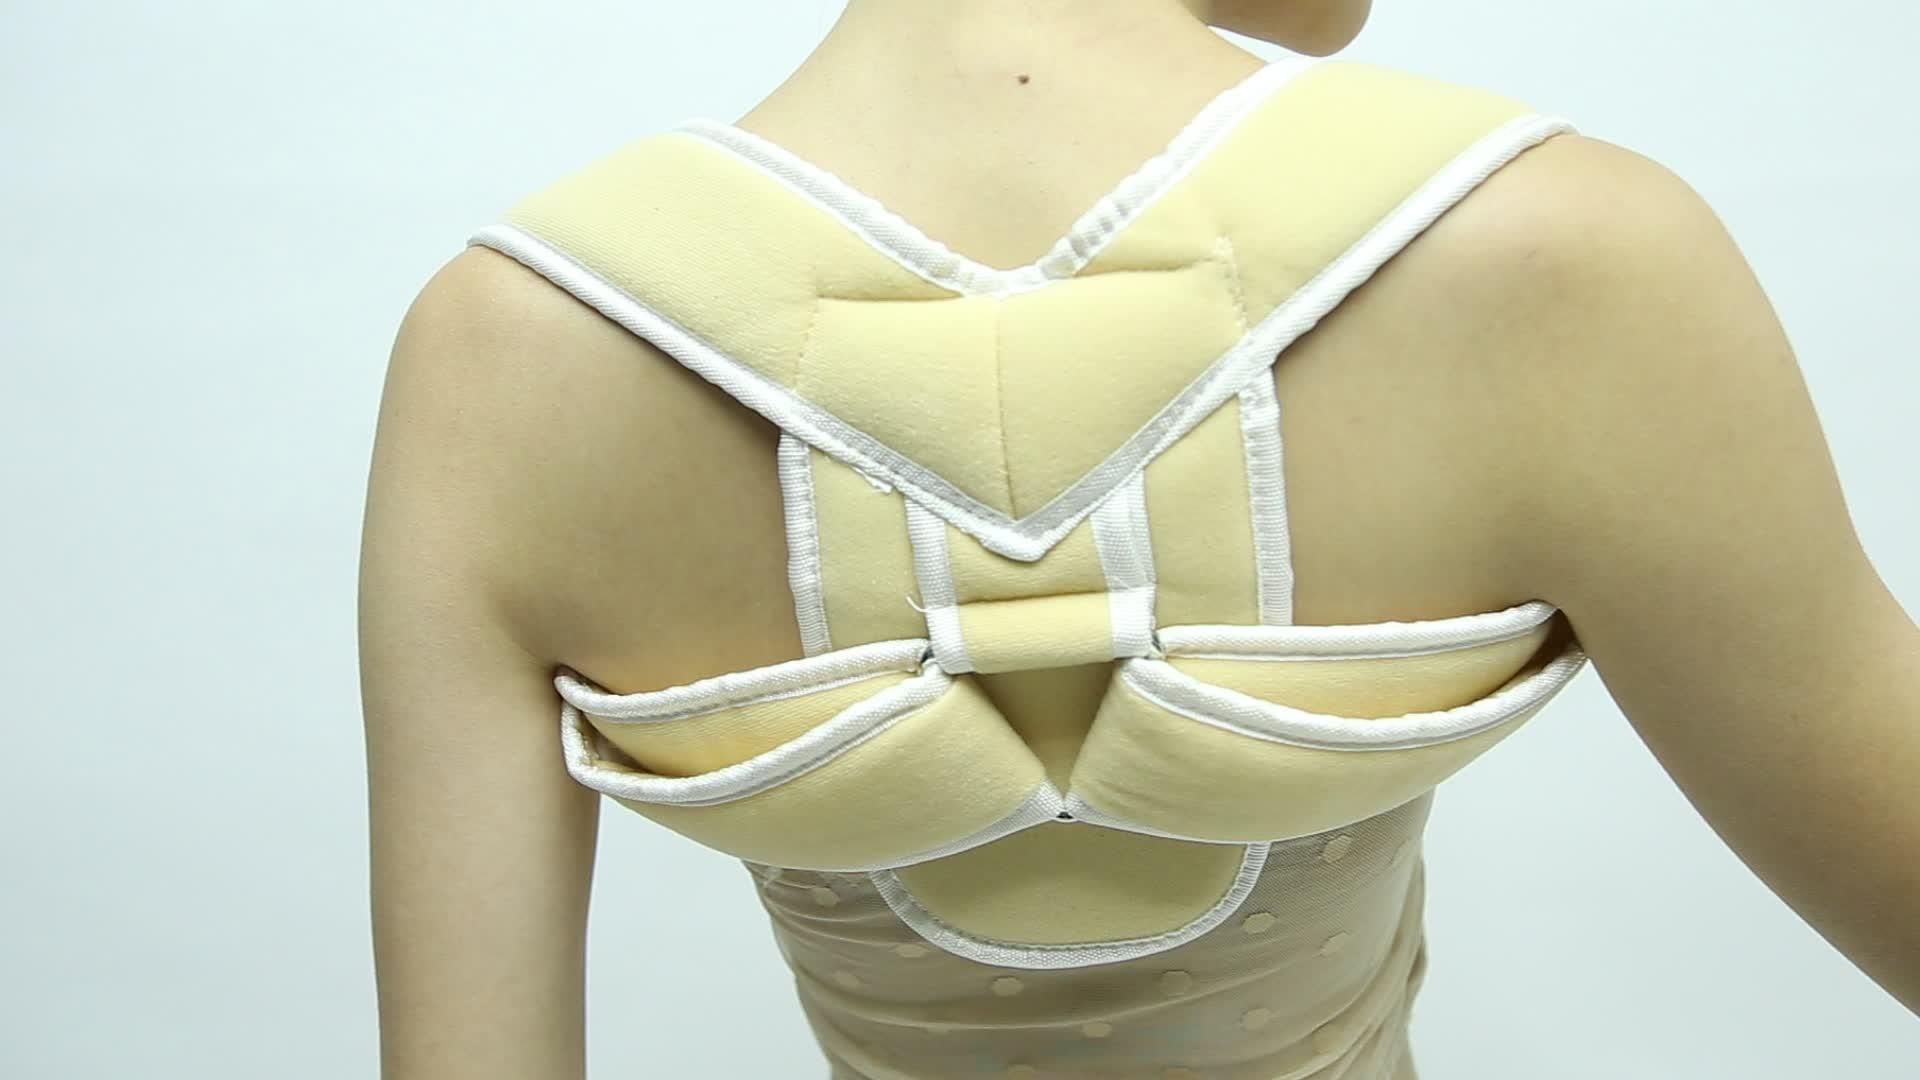 Amazon Sale foam fabric  Men and Women Clavicle Support Back Posture Corrector Brace